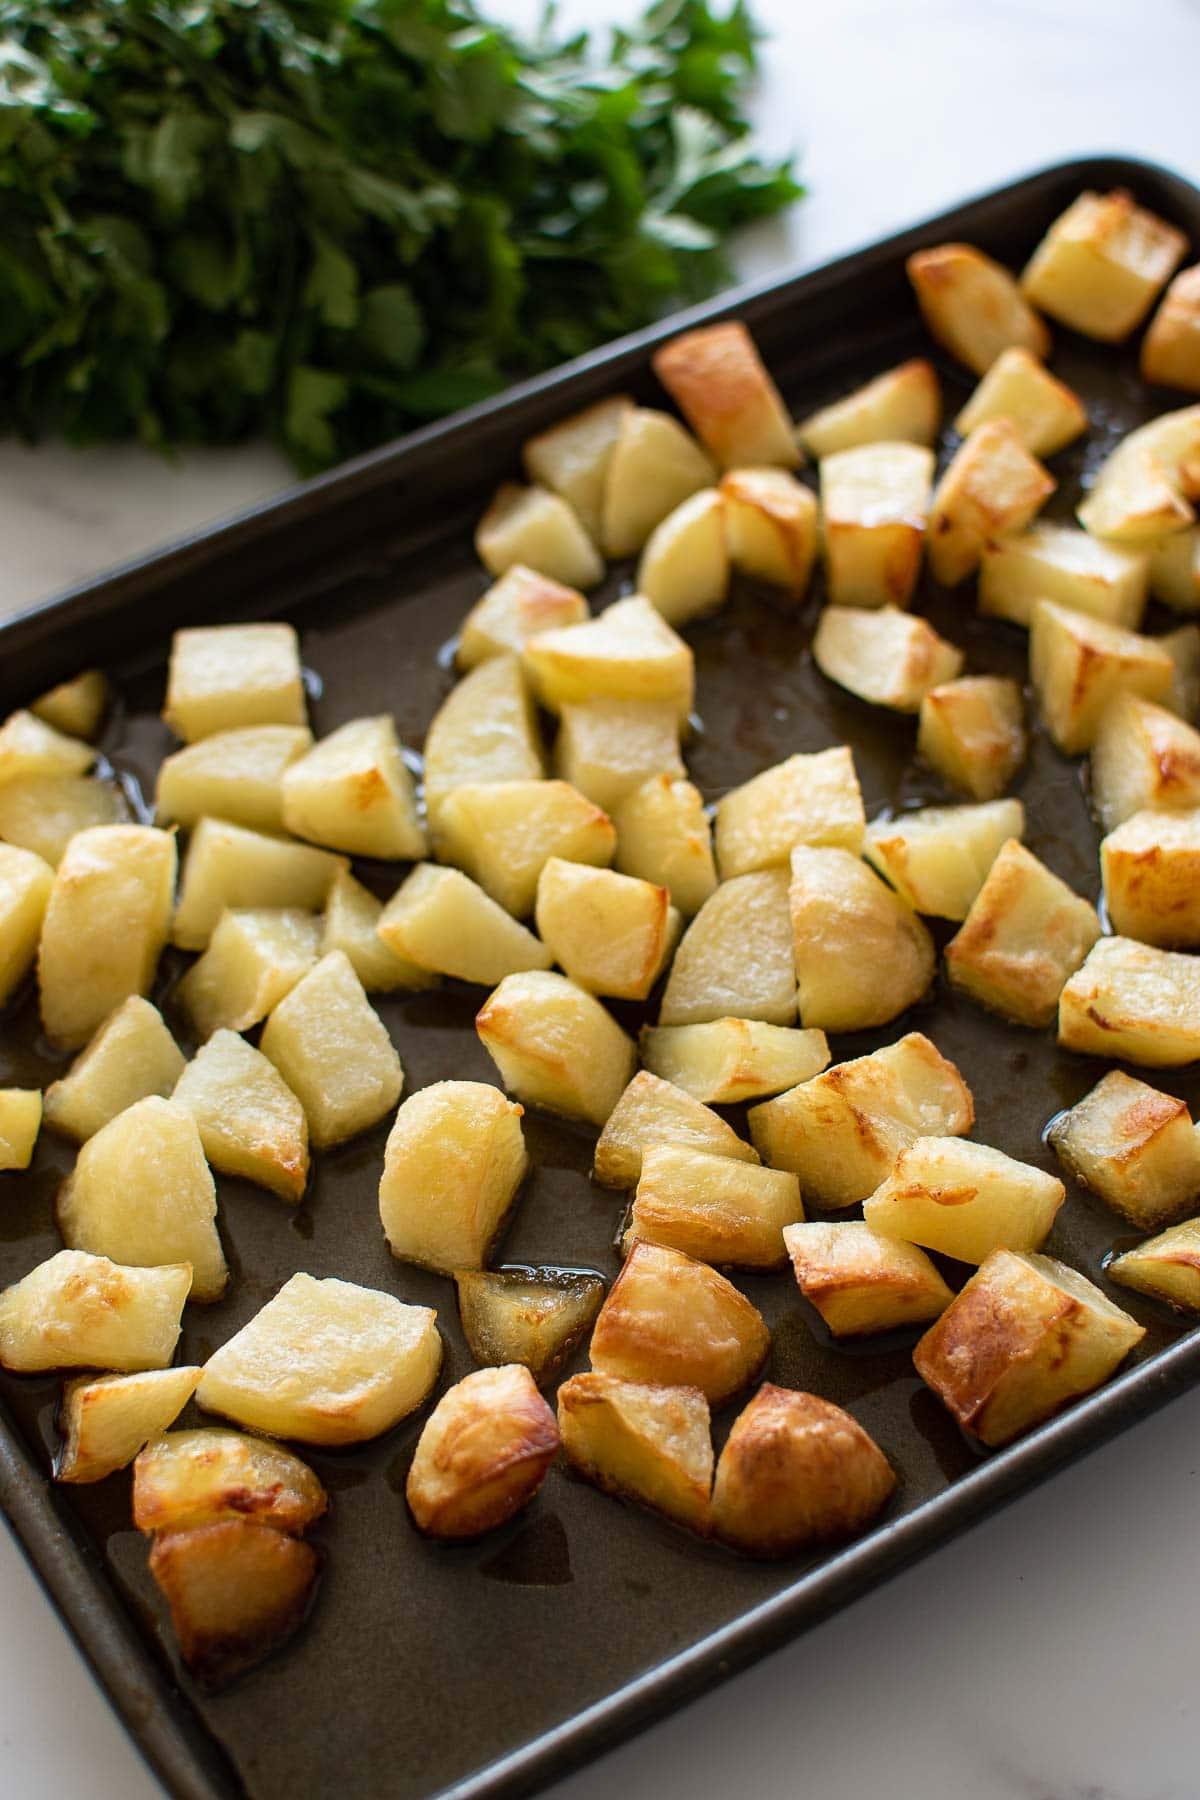 Parmentier potatoes cubed roast potatoes on a baking sheet.